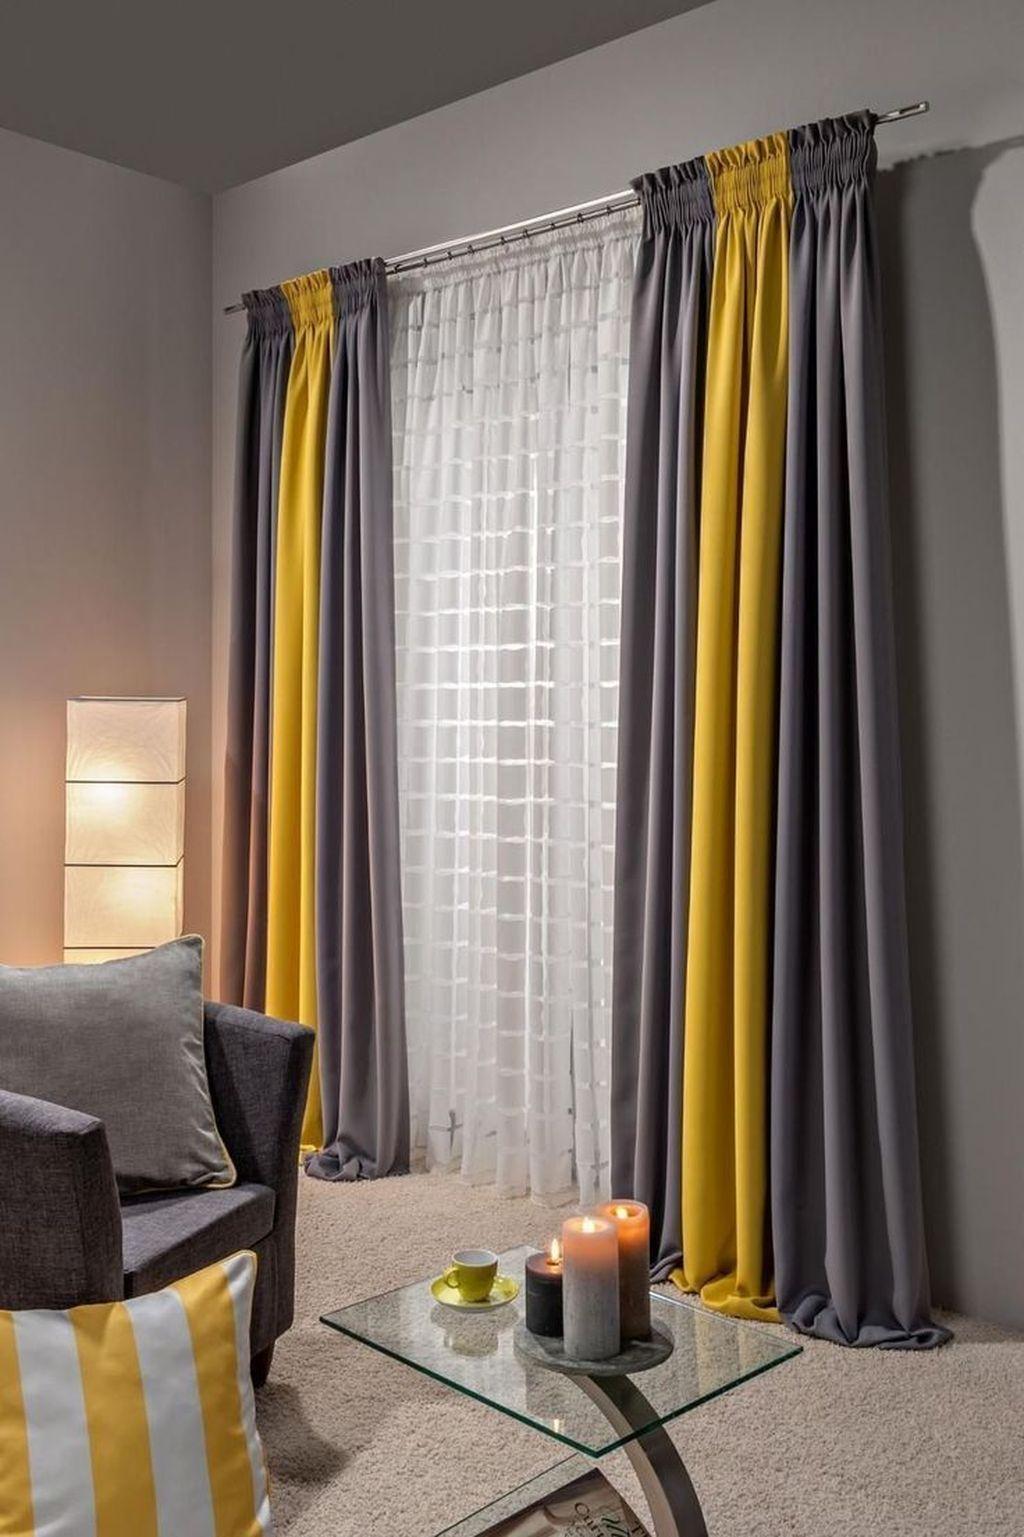 44 Cozy Curtain Design Ideas For Enchanting Living Room In 2020 Curtains Living Room Living Room Decor Curtains Home Decor